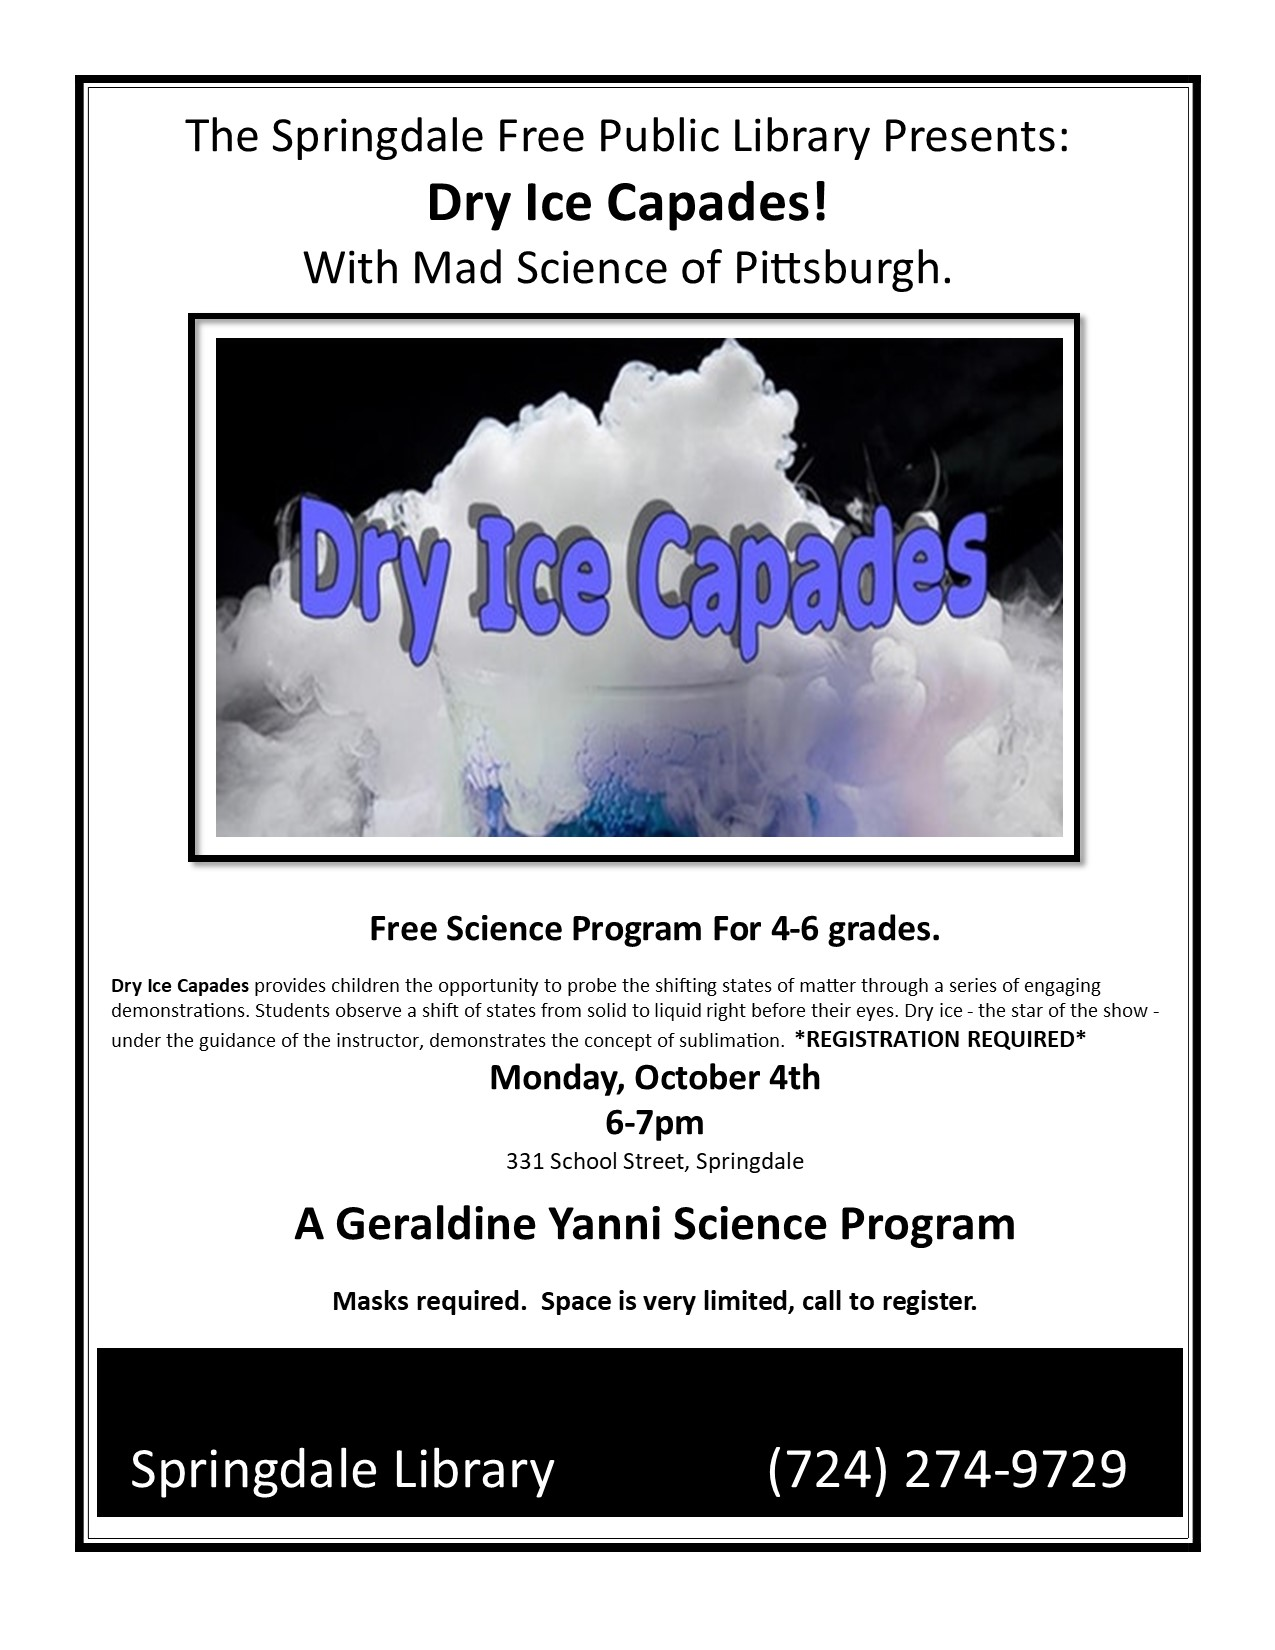 Gerladine Yanni Science Programs are back!